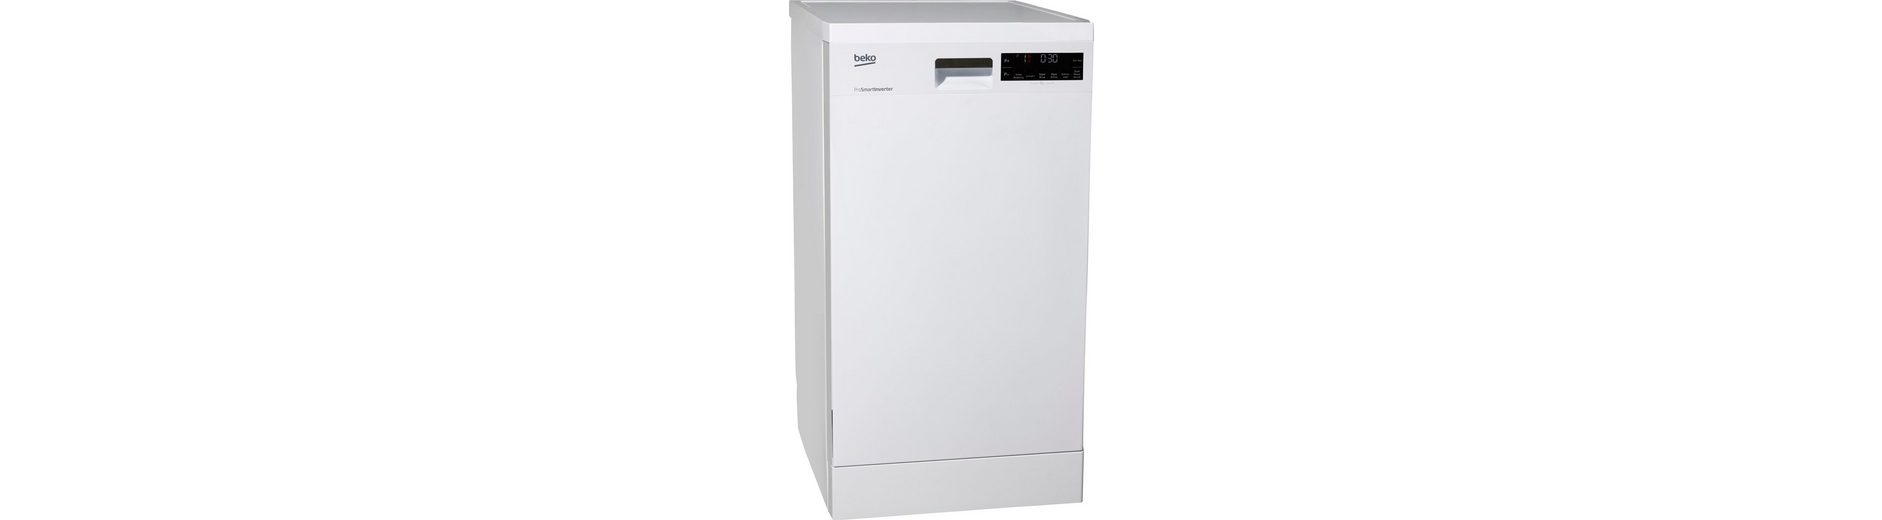 Beko Geschirrspüler DFS28020W, Energieklasse A++, 10 Maßgedecke